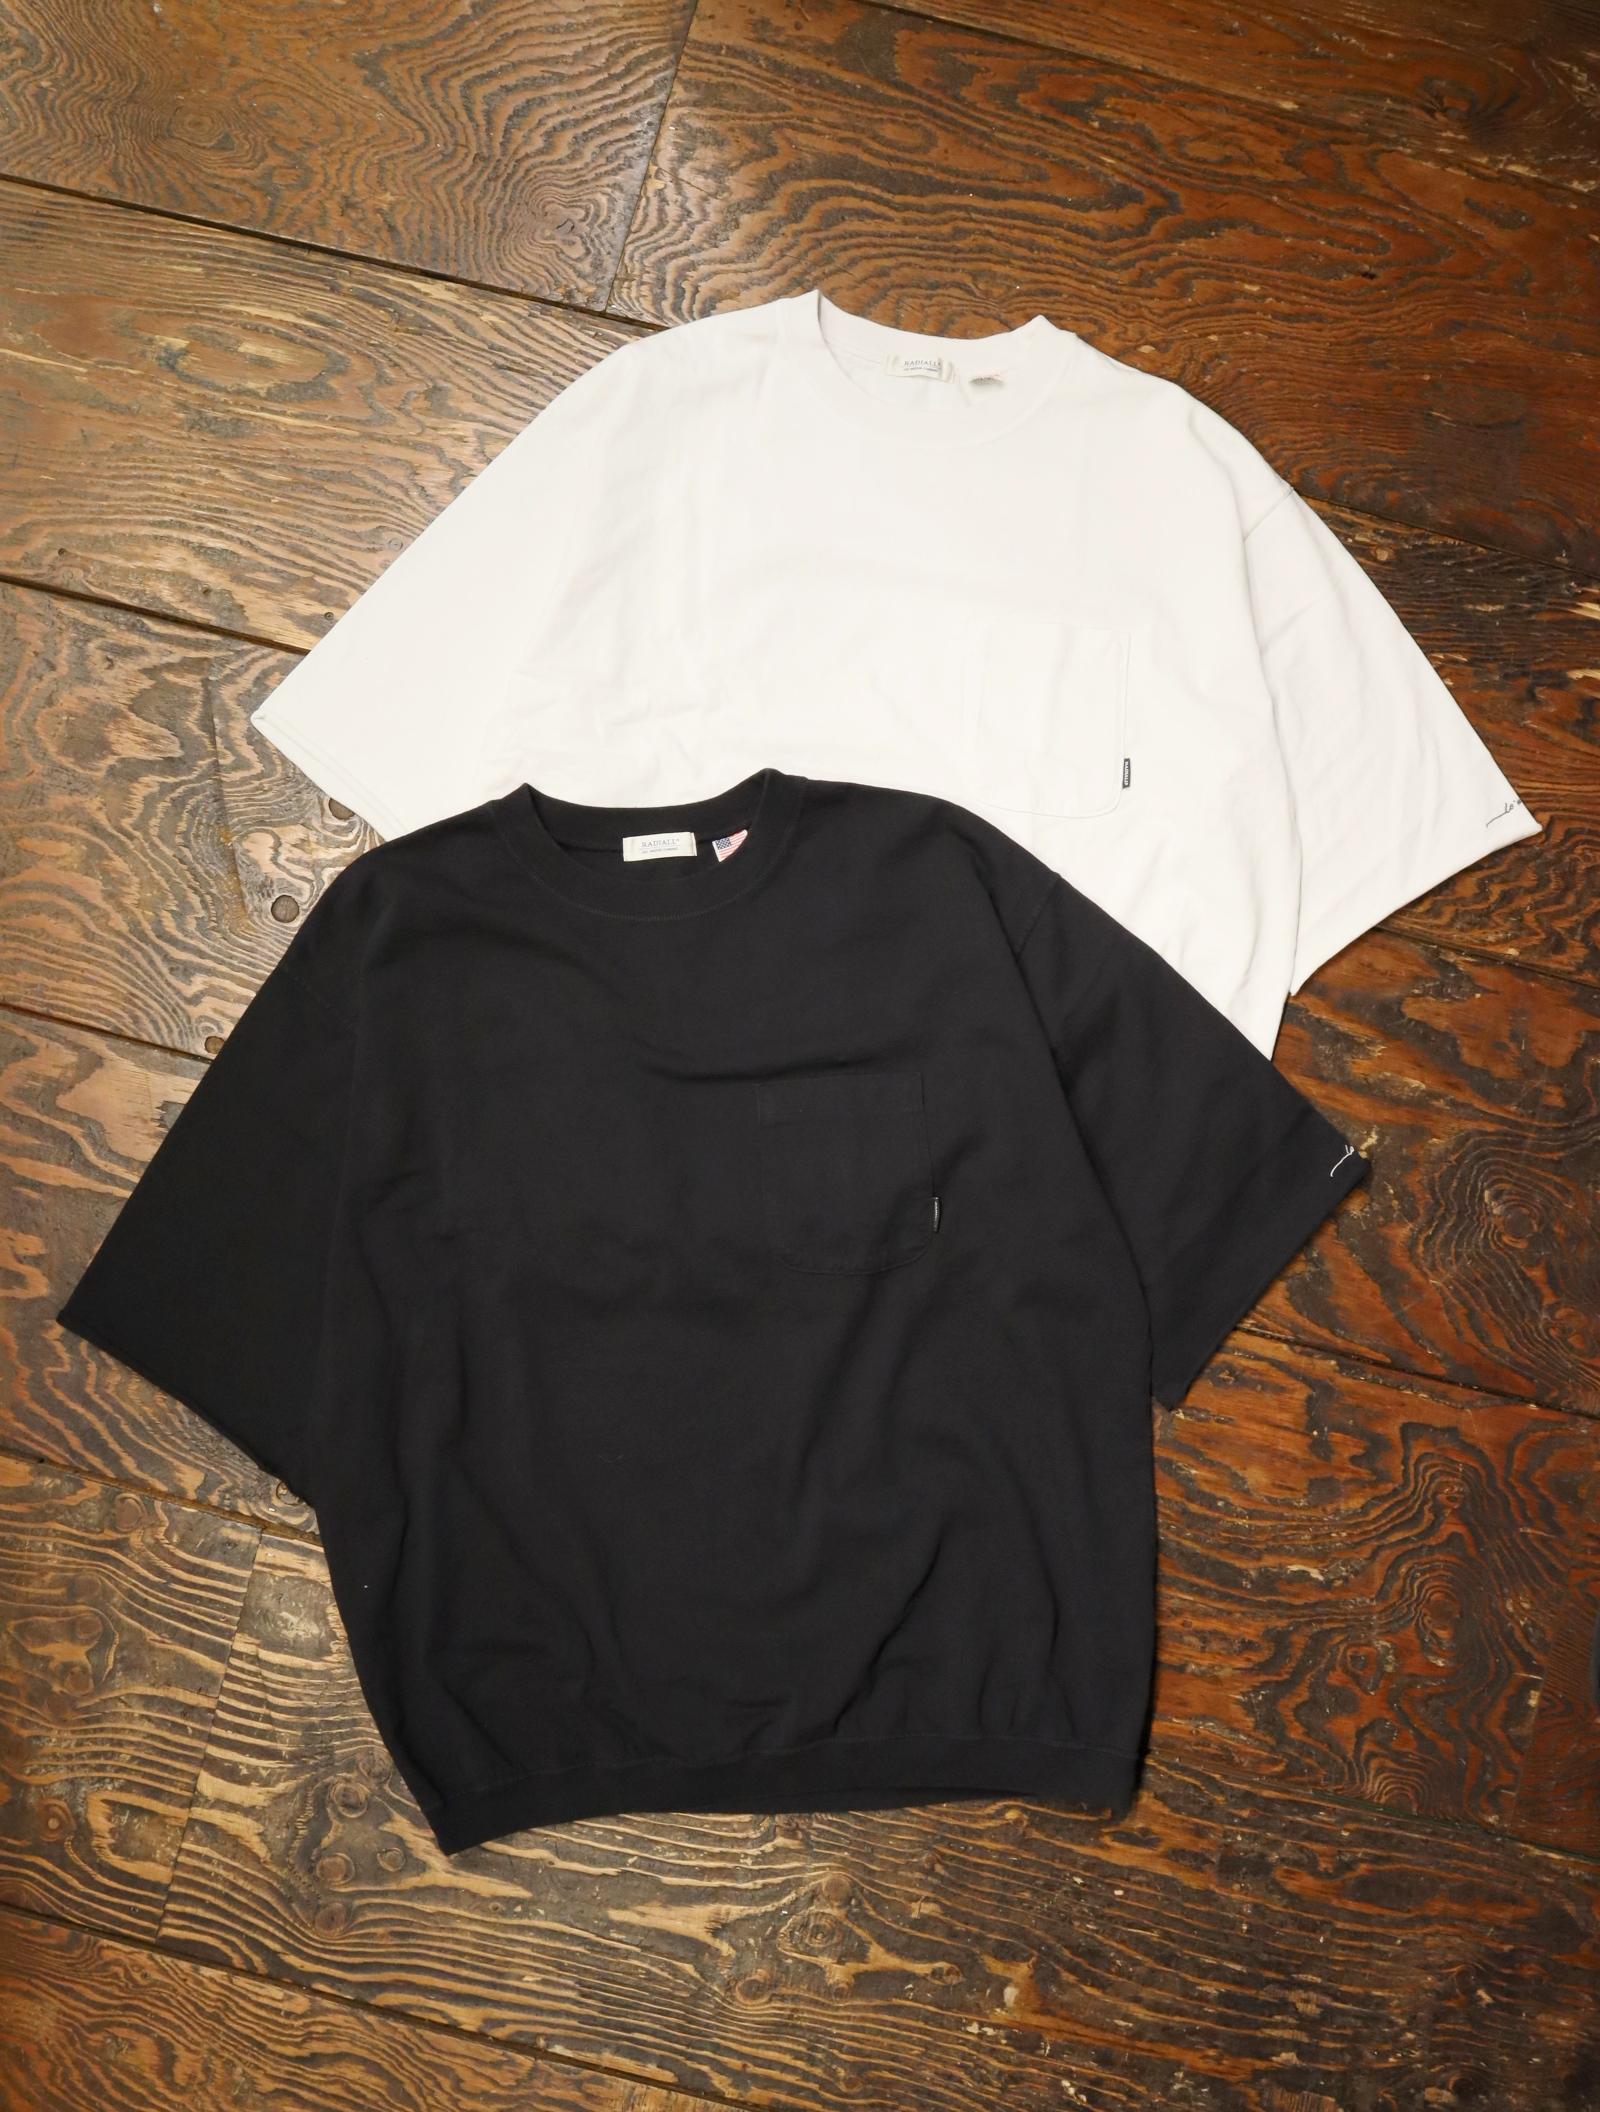 RADIALL  「FLEETLINE - CREW NECK T-SHIRT S/S」  ハーフスリーブティーシャツ